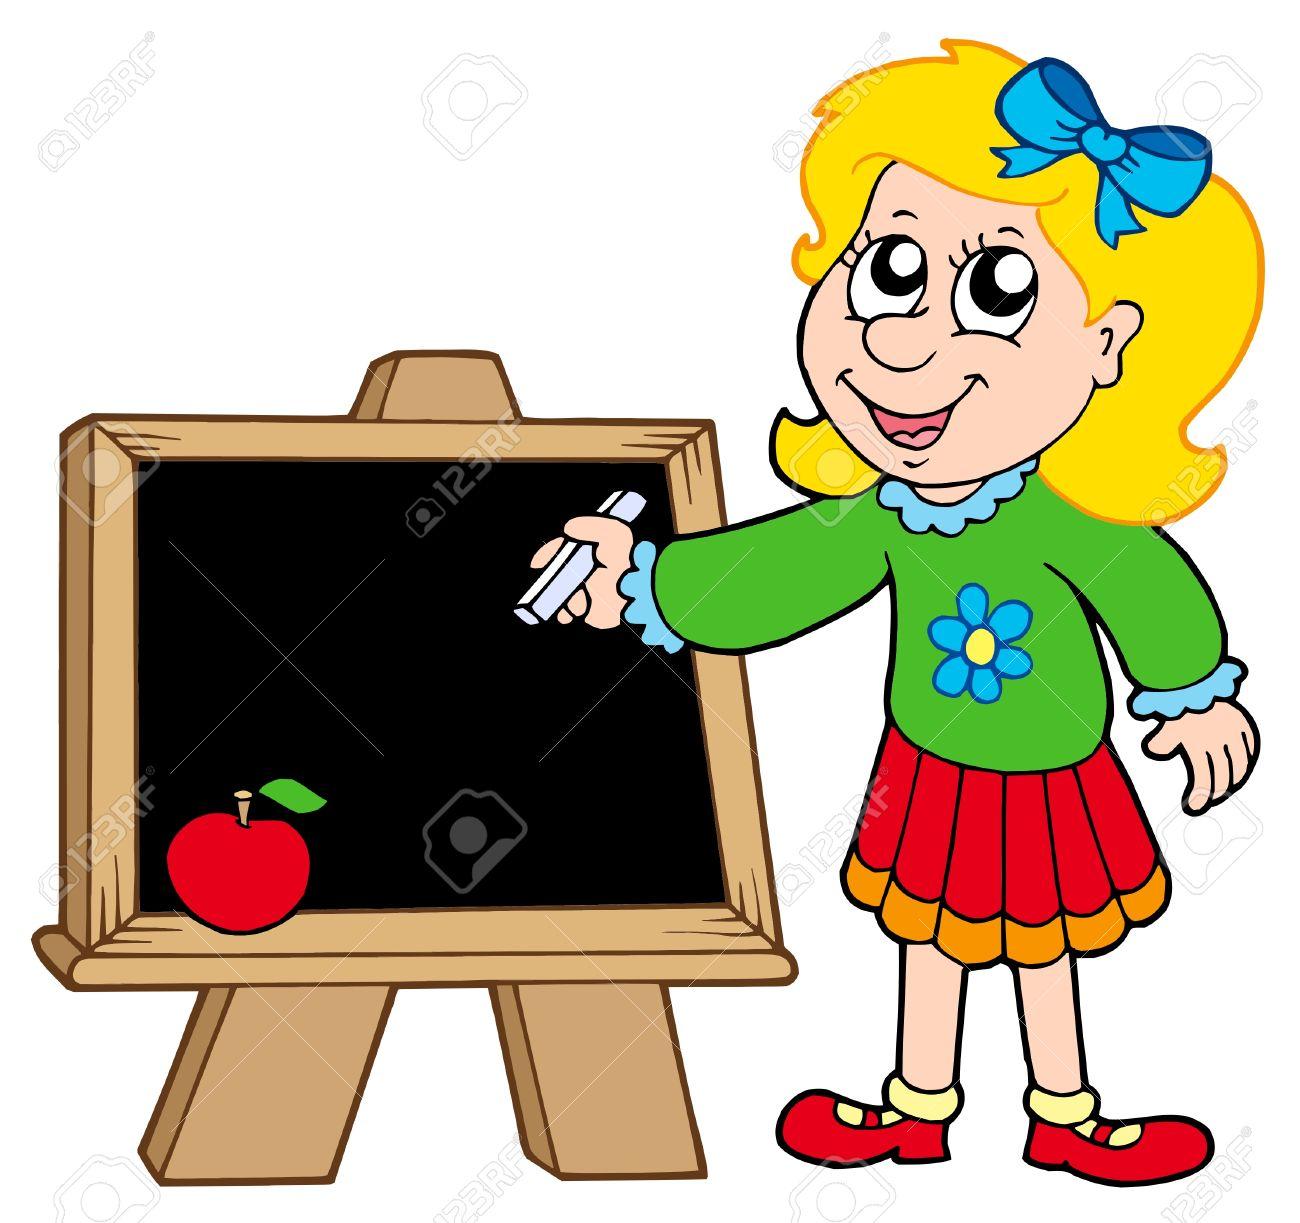 School girl writing on blackboard - vector illustration. Stock Vector - 5192840